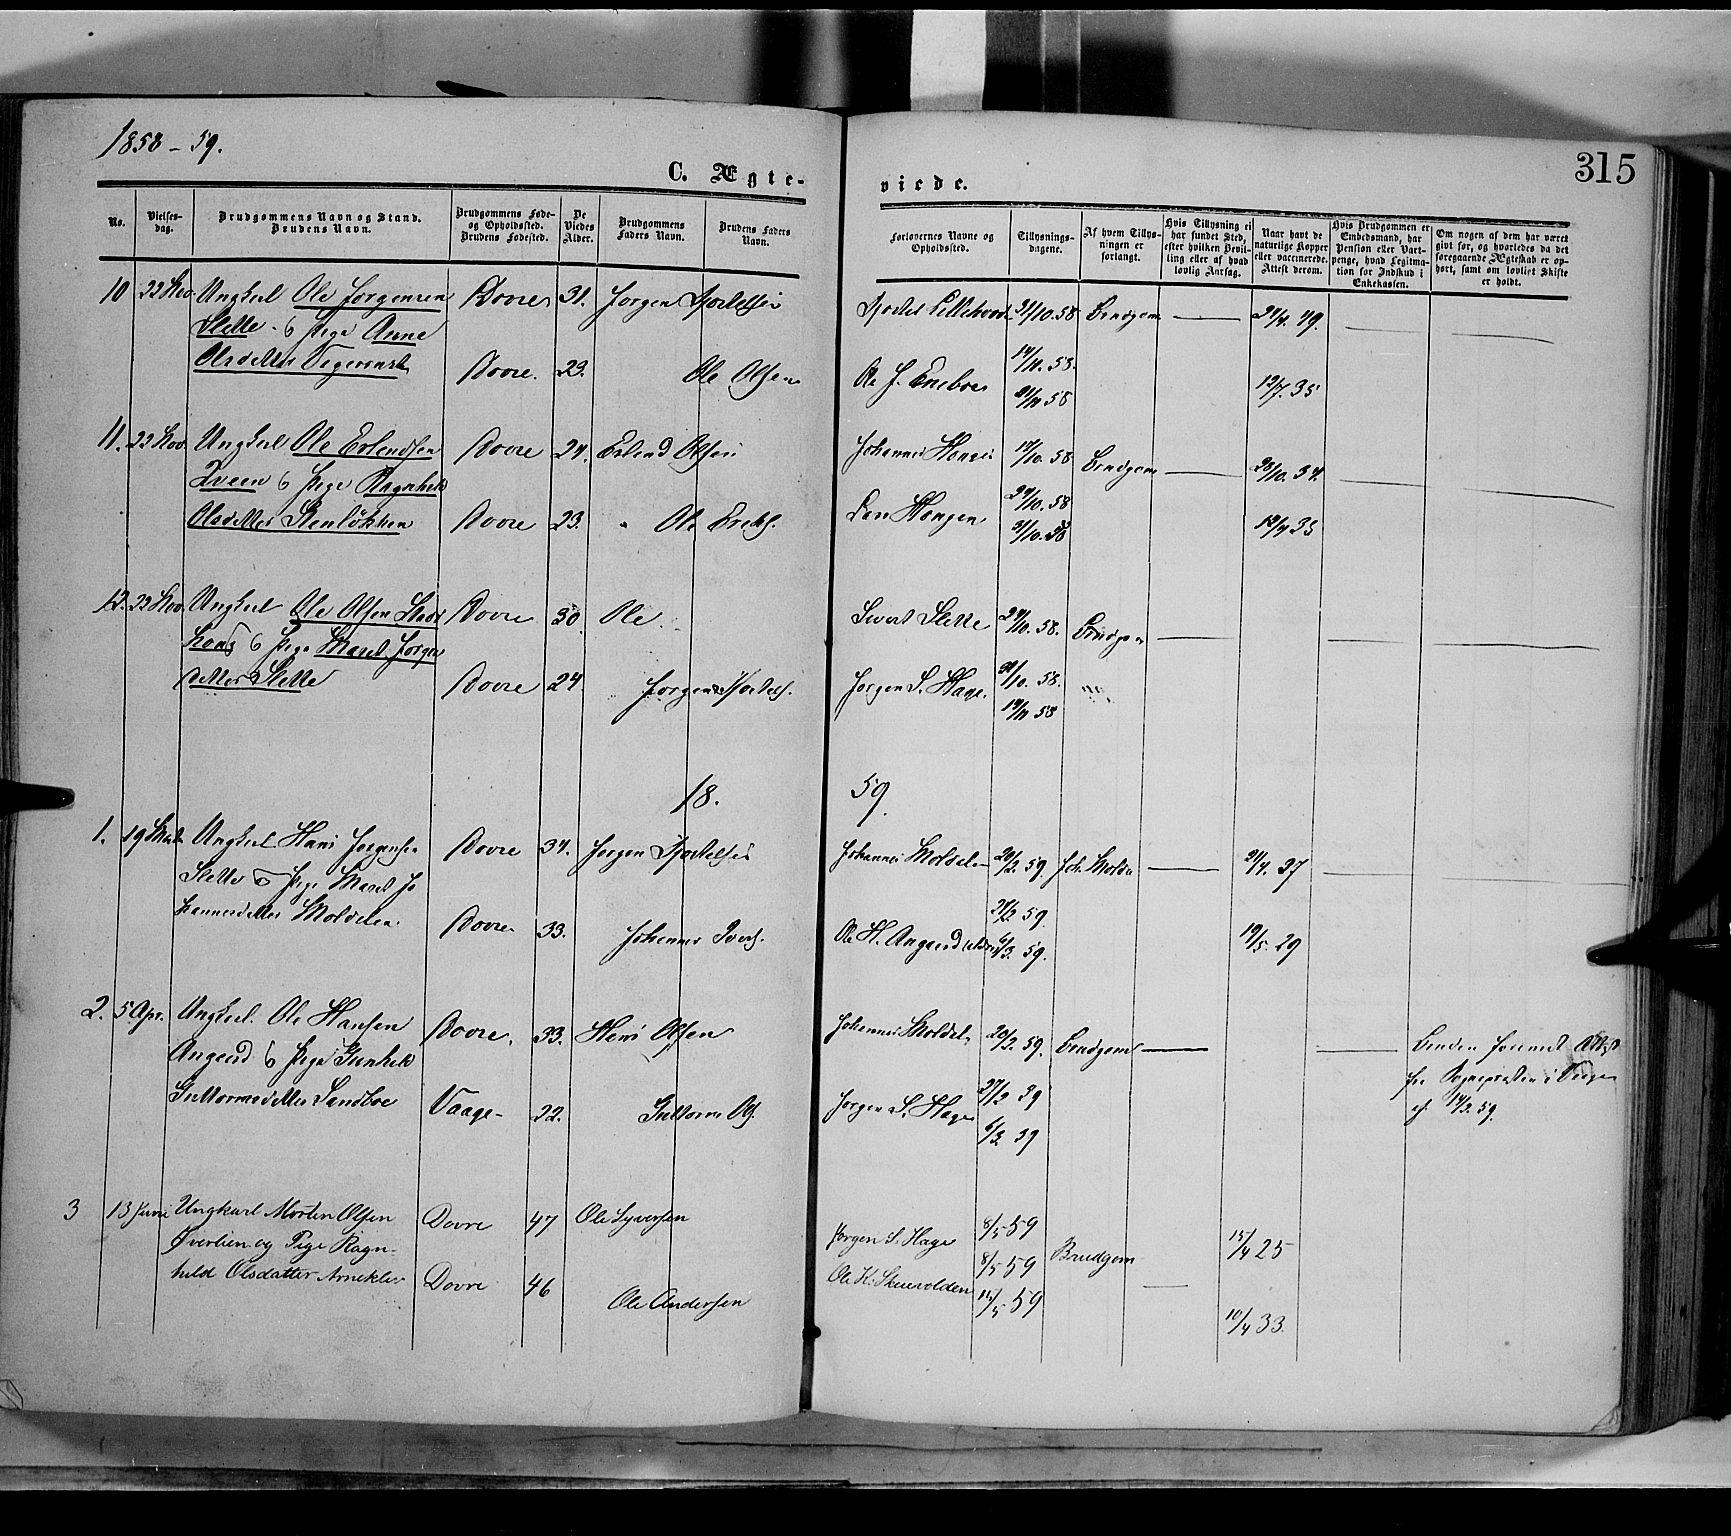 SAH, Dovre prestekontor, Ministerialbok nr. 1, 1854-1878, s. 315